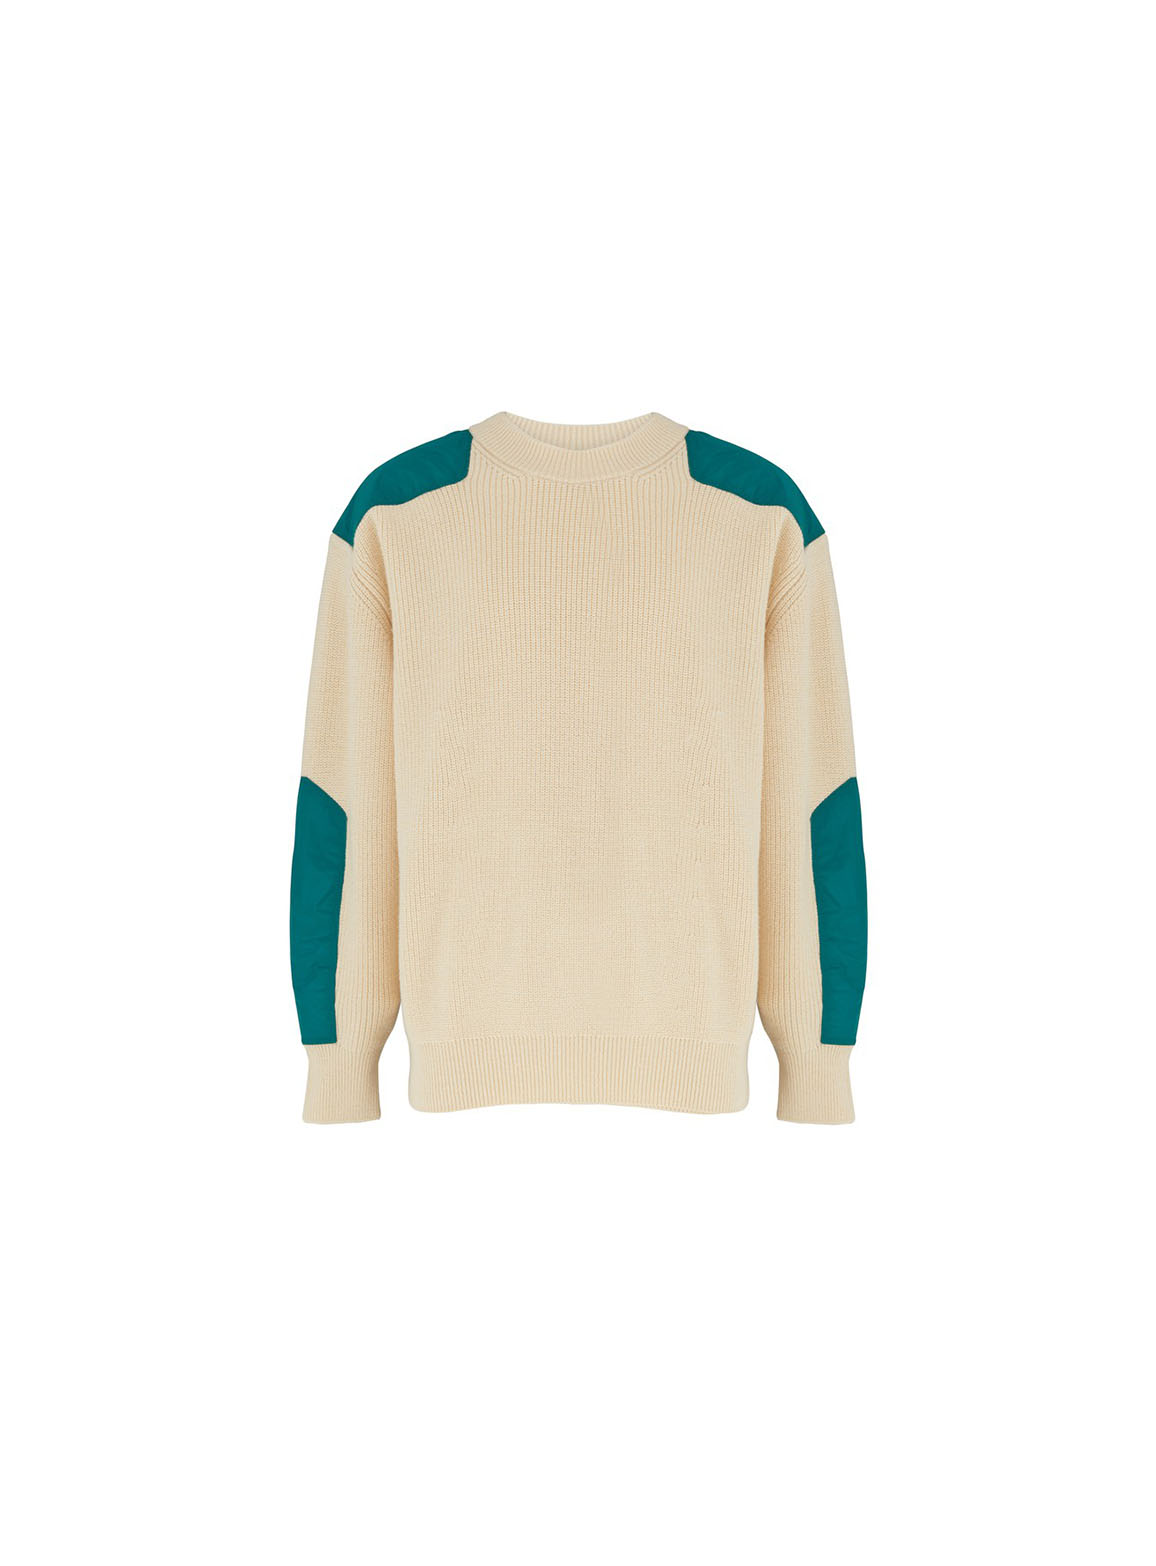 Denys sweatshirt